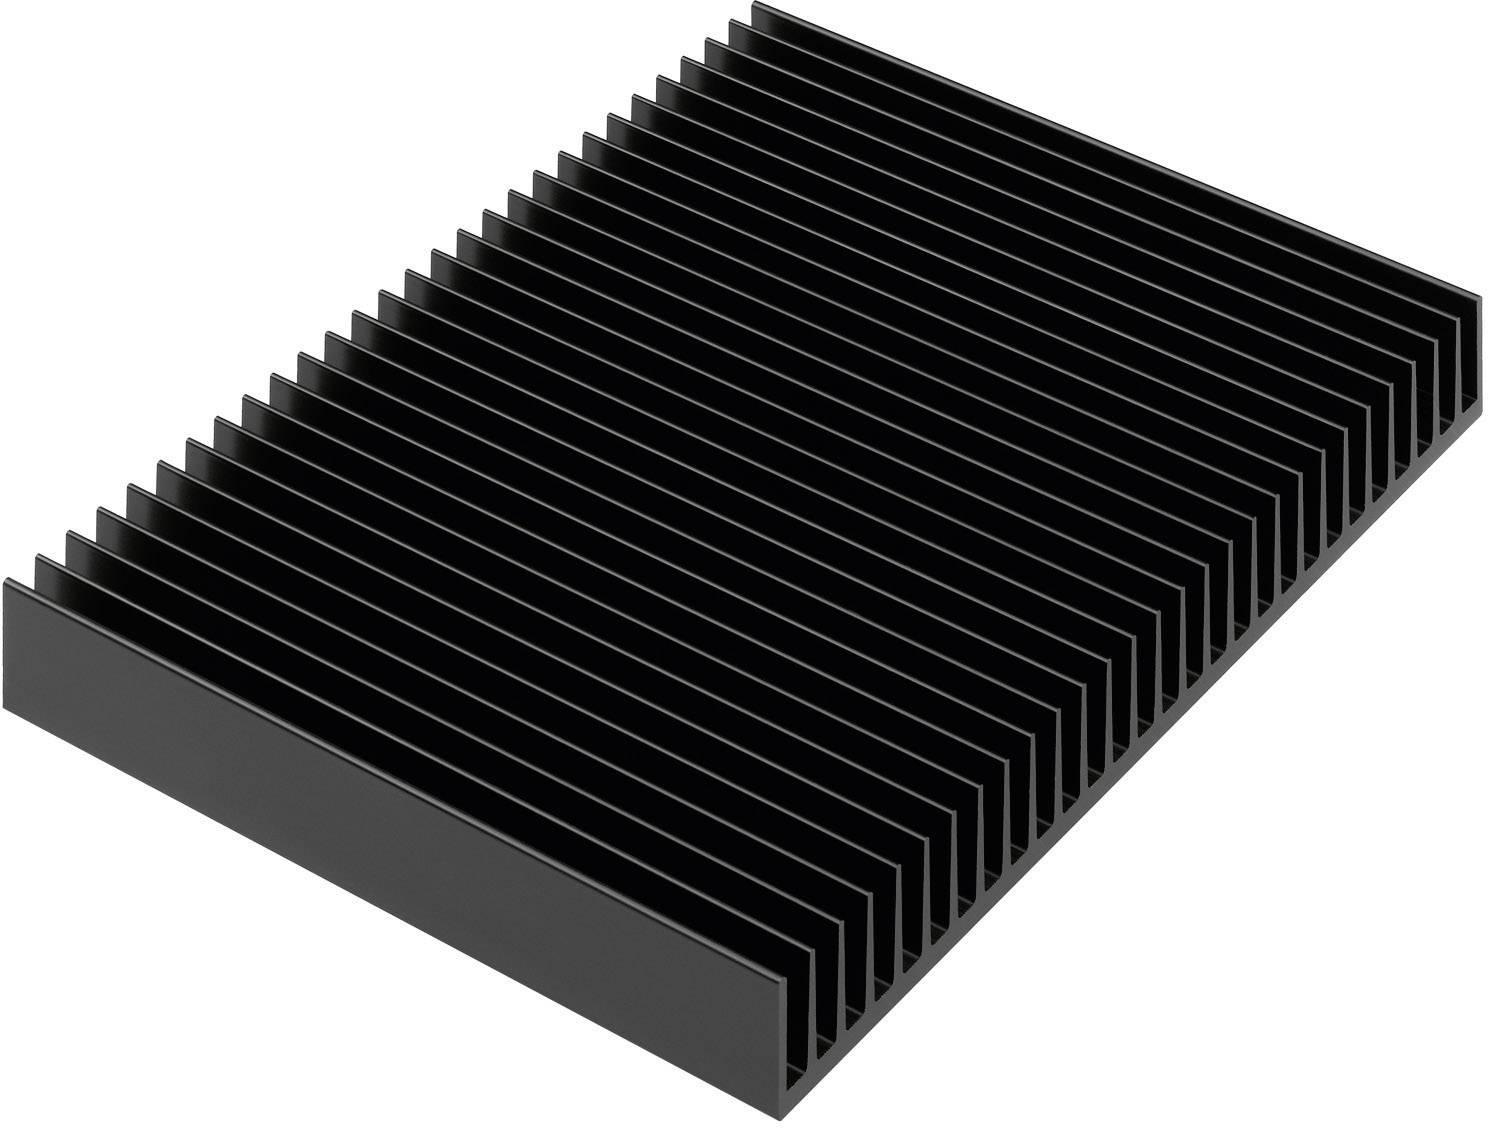 Profilový chladič Pada Engineering 8232/150/N 8232/150/N, 0.95 K/W, (d x š x v) 150 x 200 x 25 mm